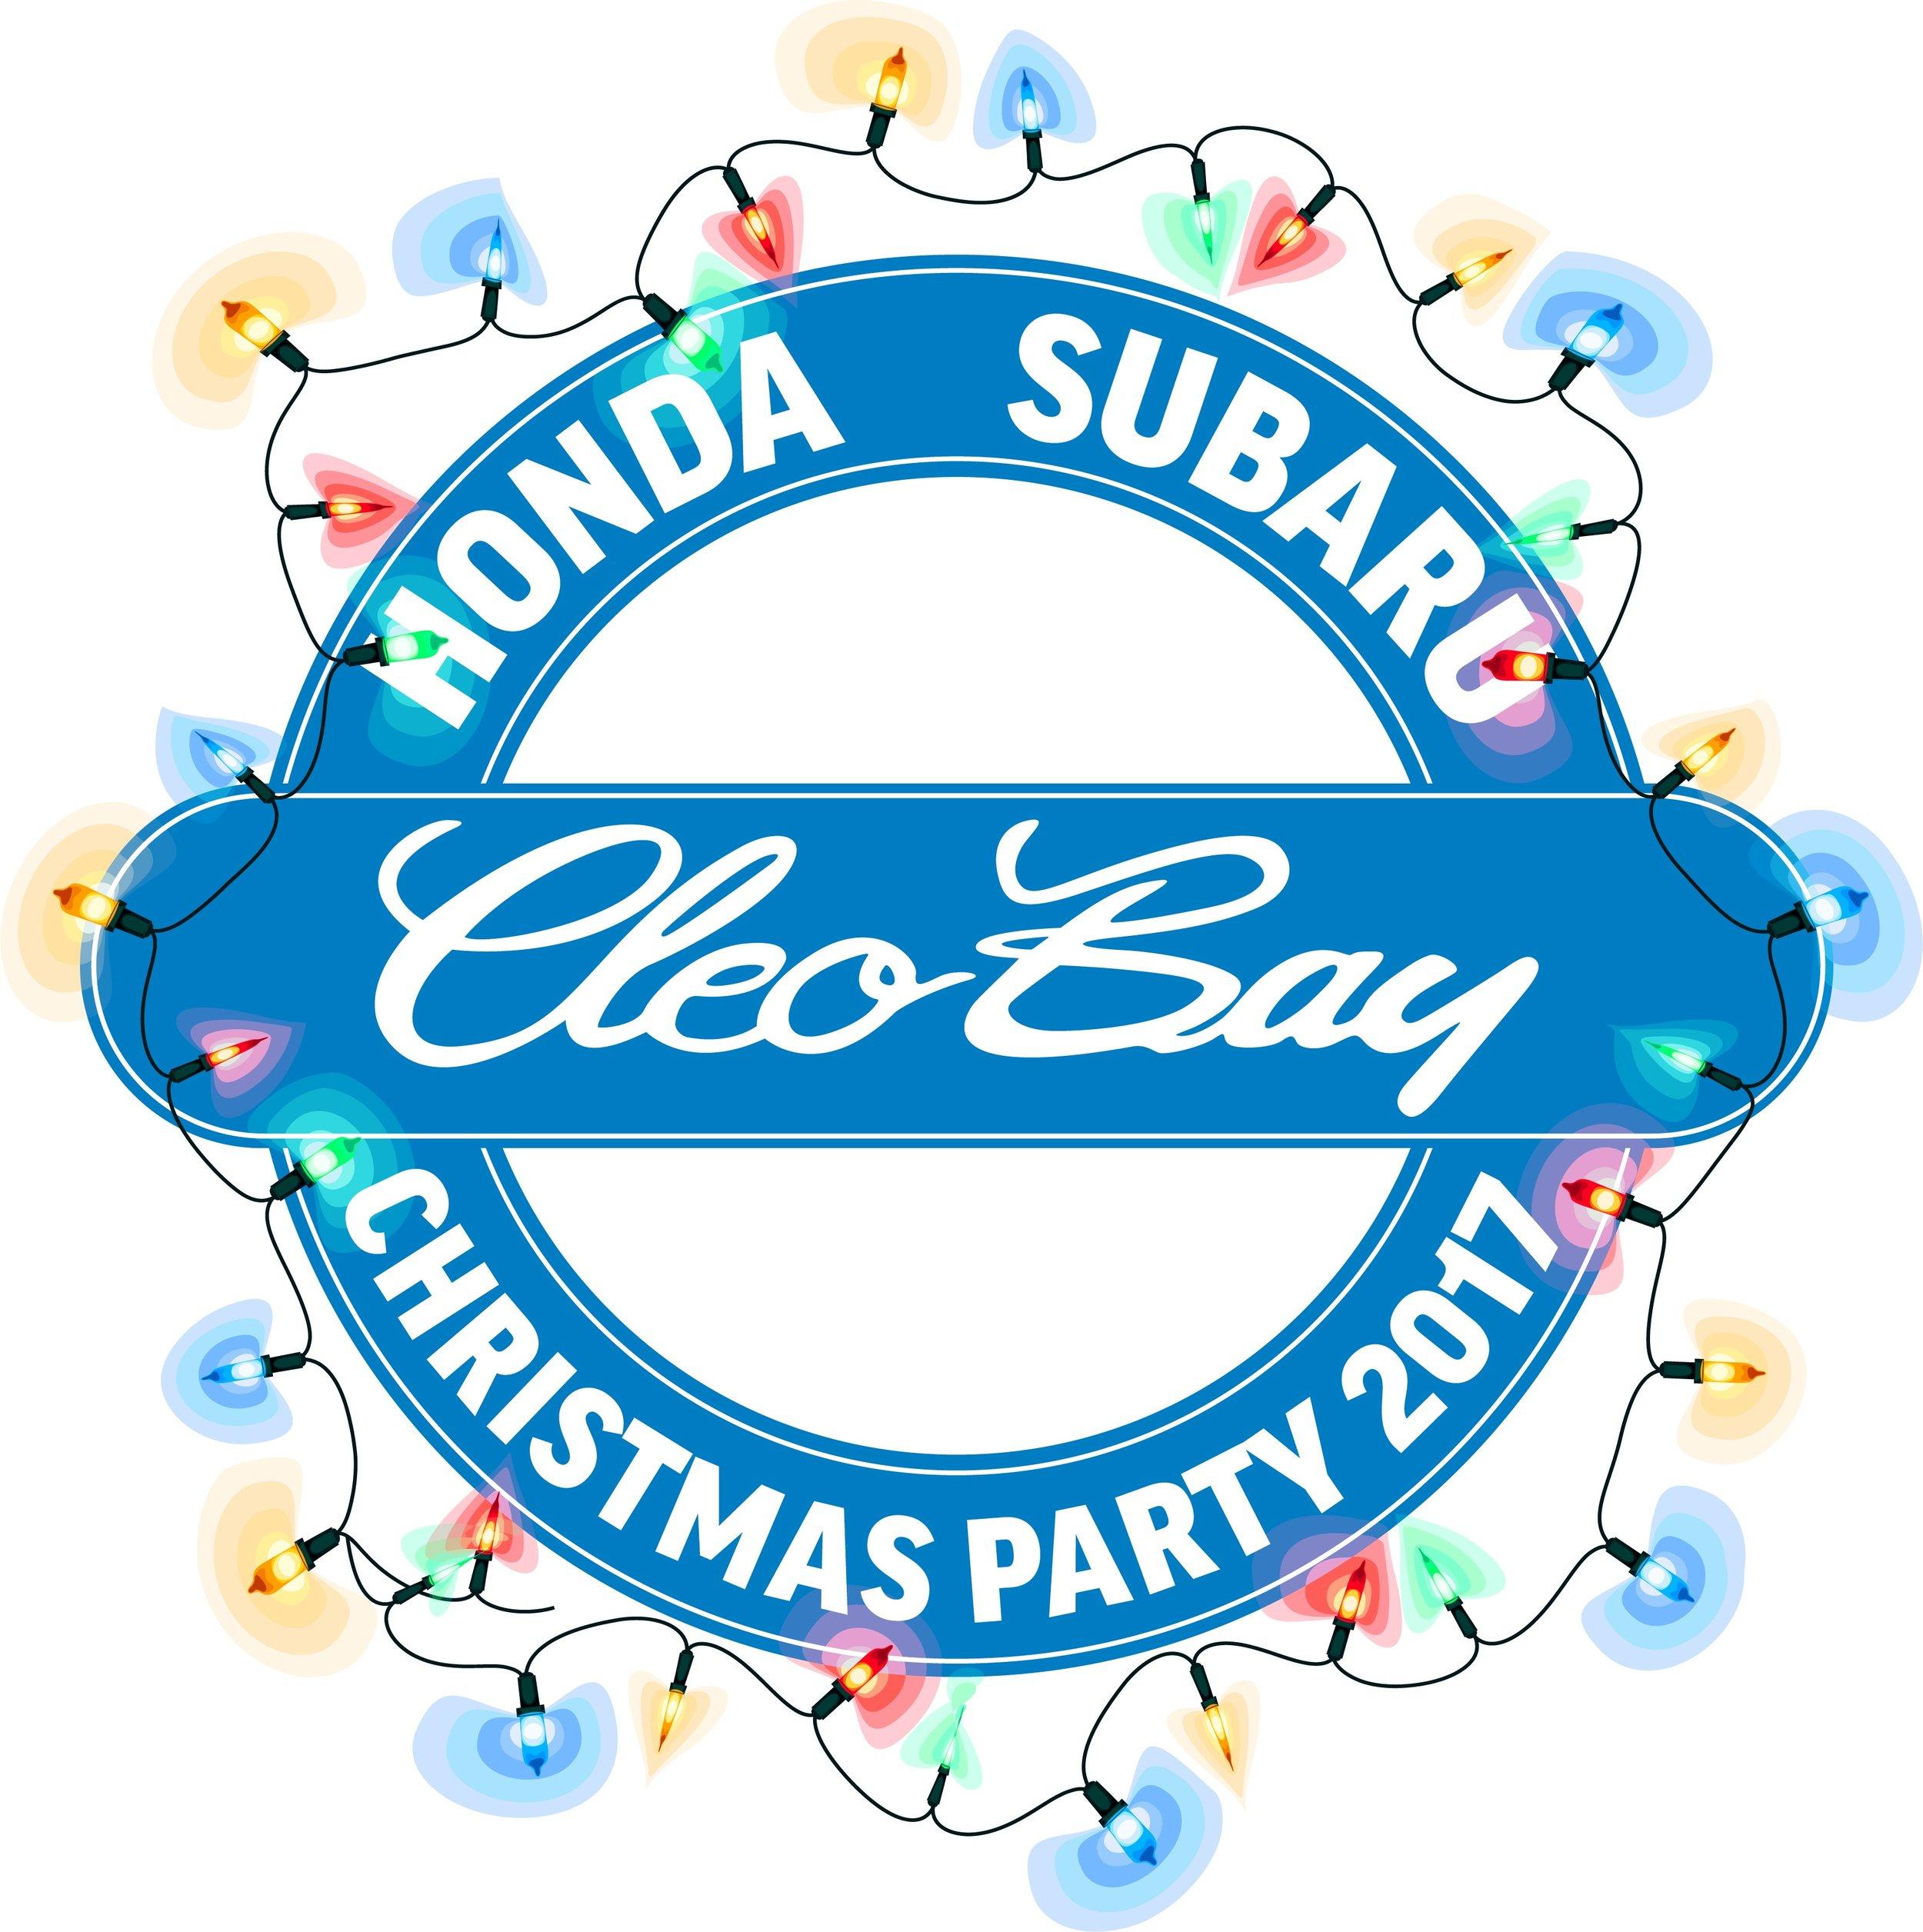 CB_christmas_party2.jpg